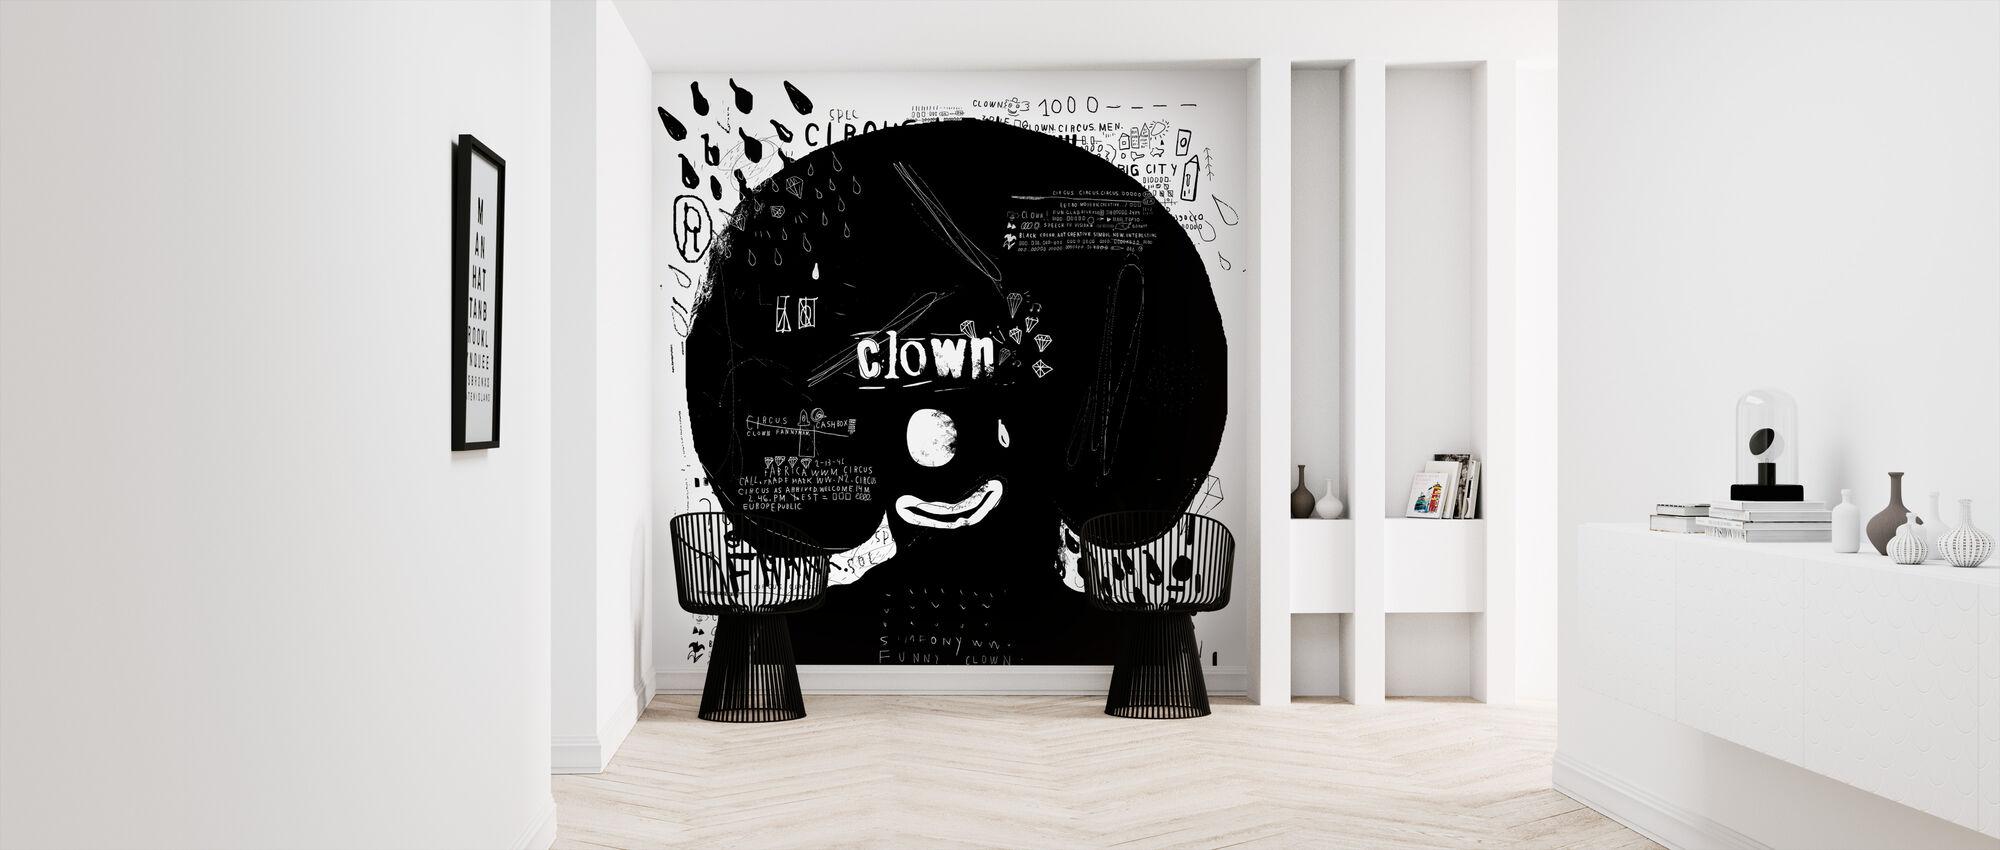 Clown - Wallpaper - Hallway